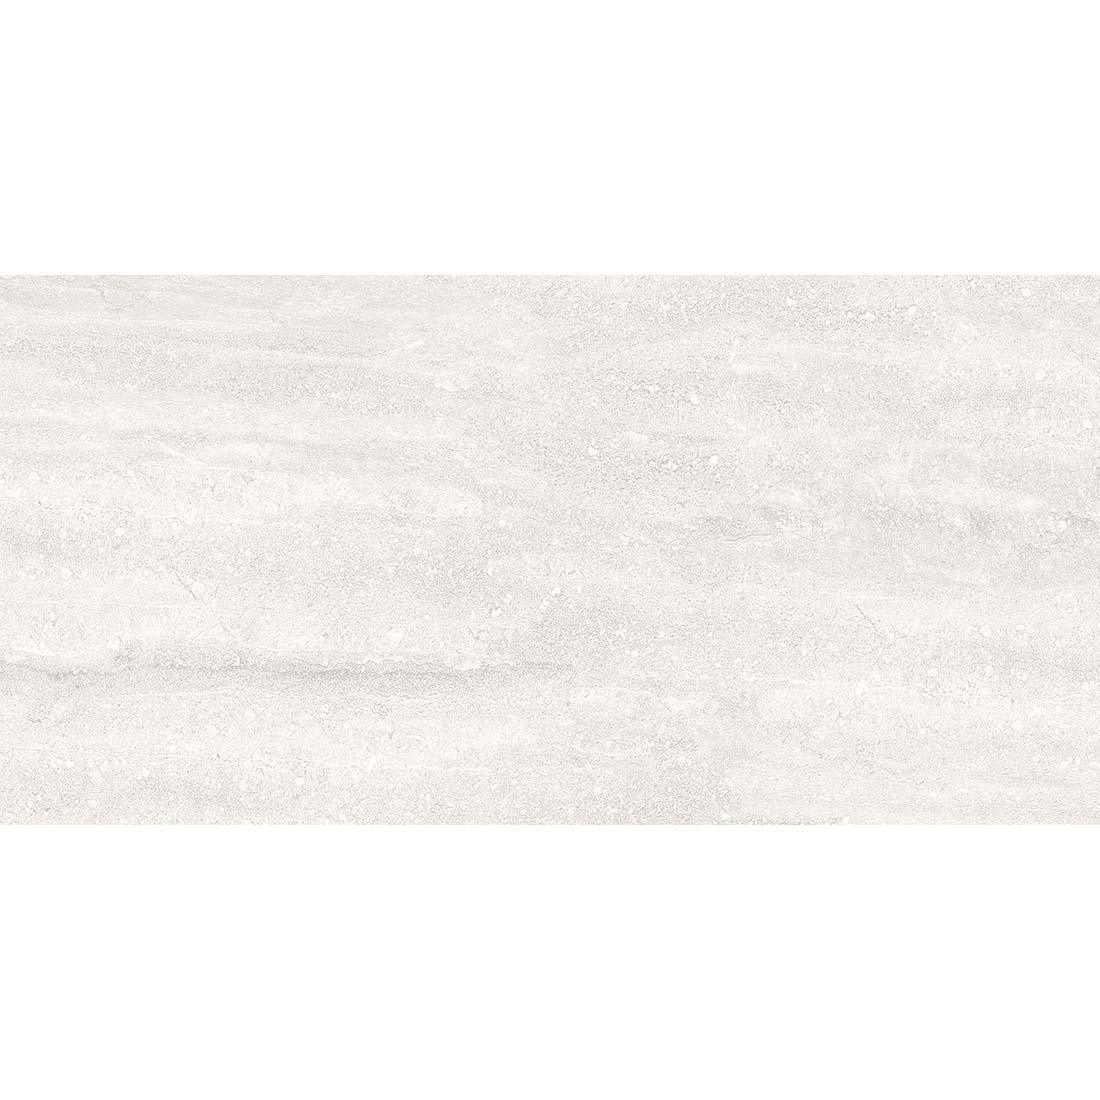 Clasico 25x50 Light Grey Gloss 1